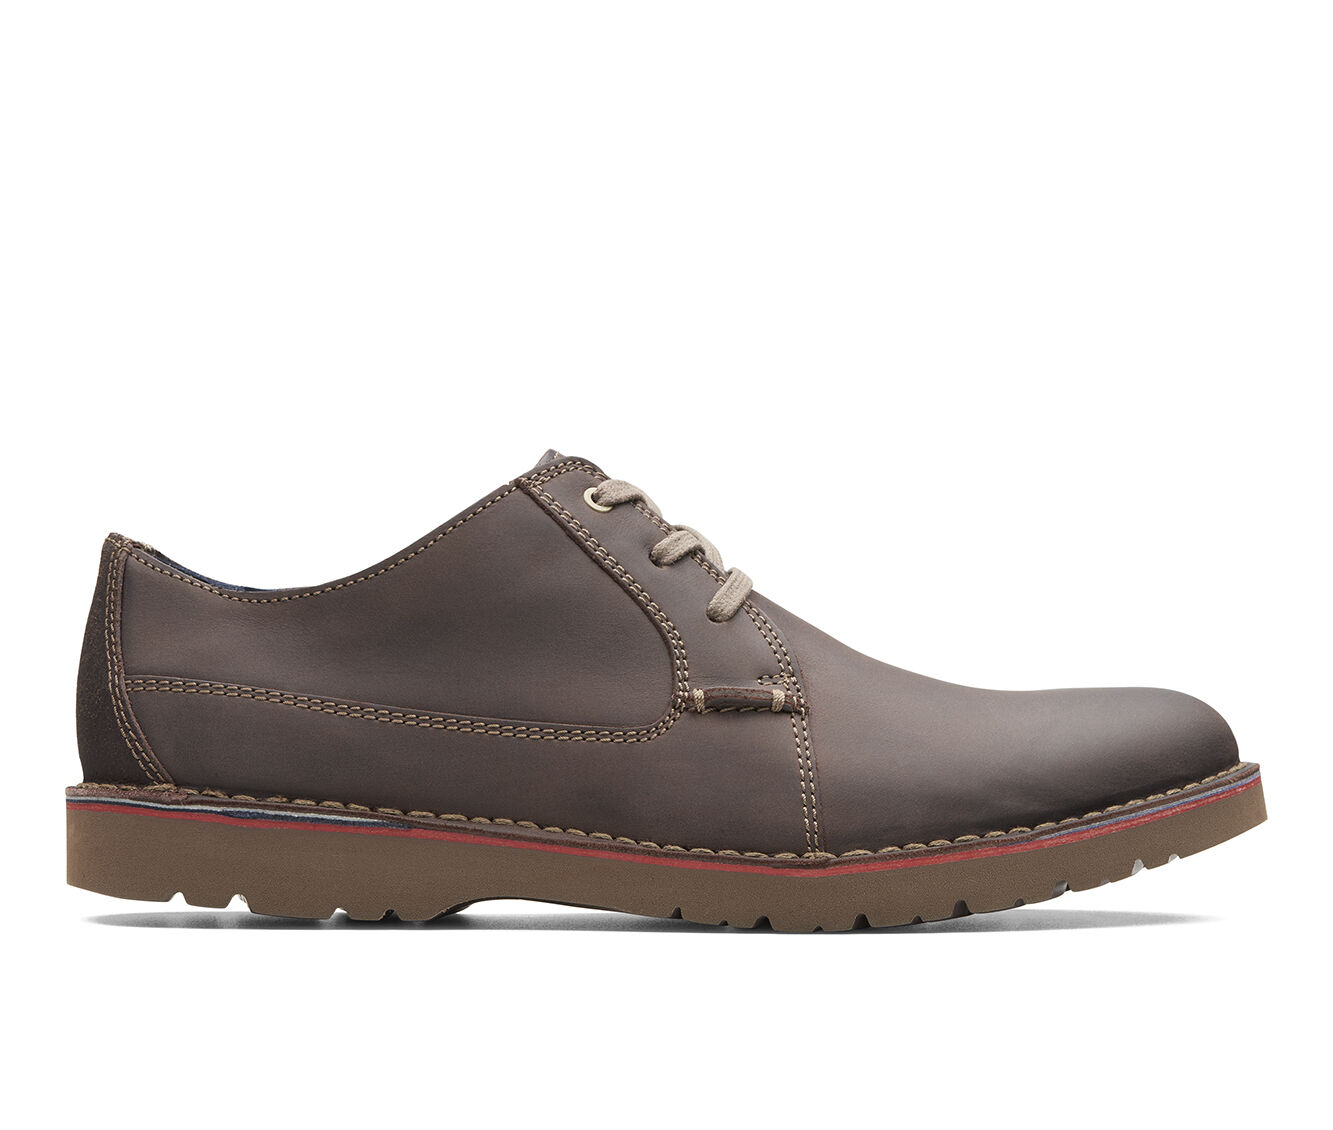 Men's Clarks Vargo Plain Dress Shoes Dark Brown